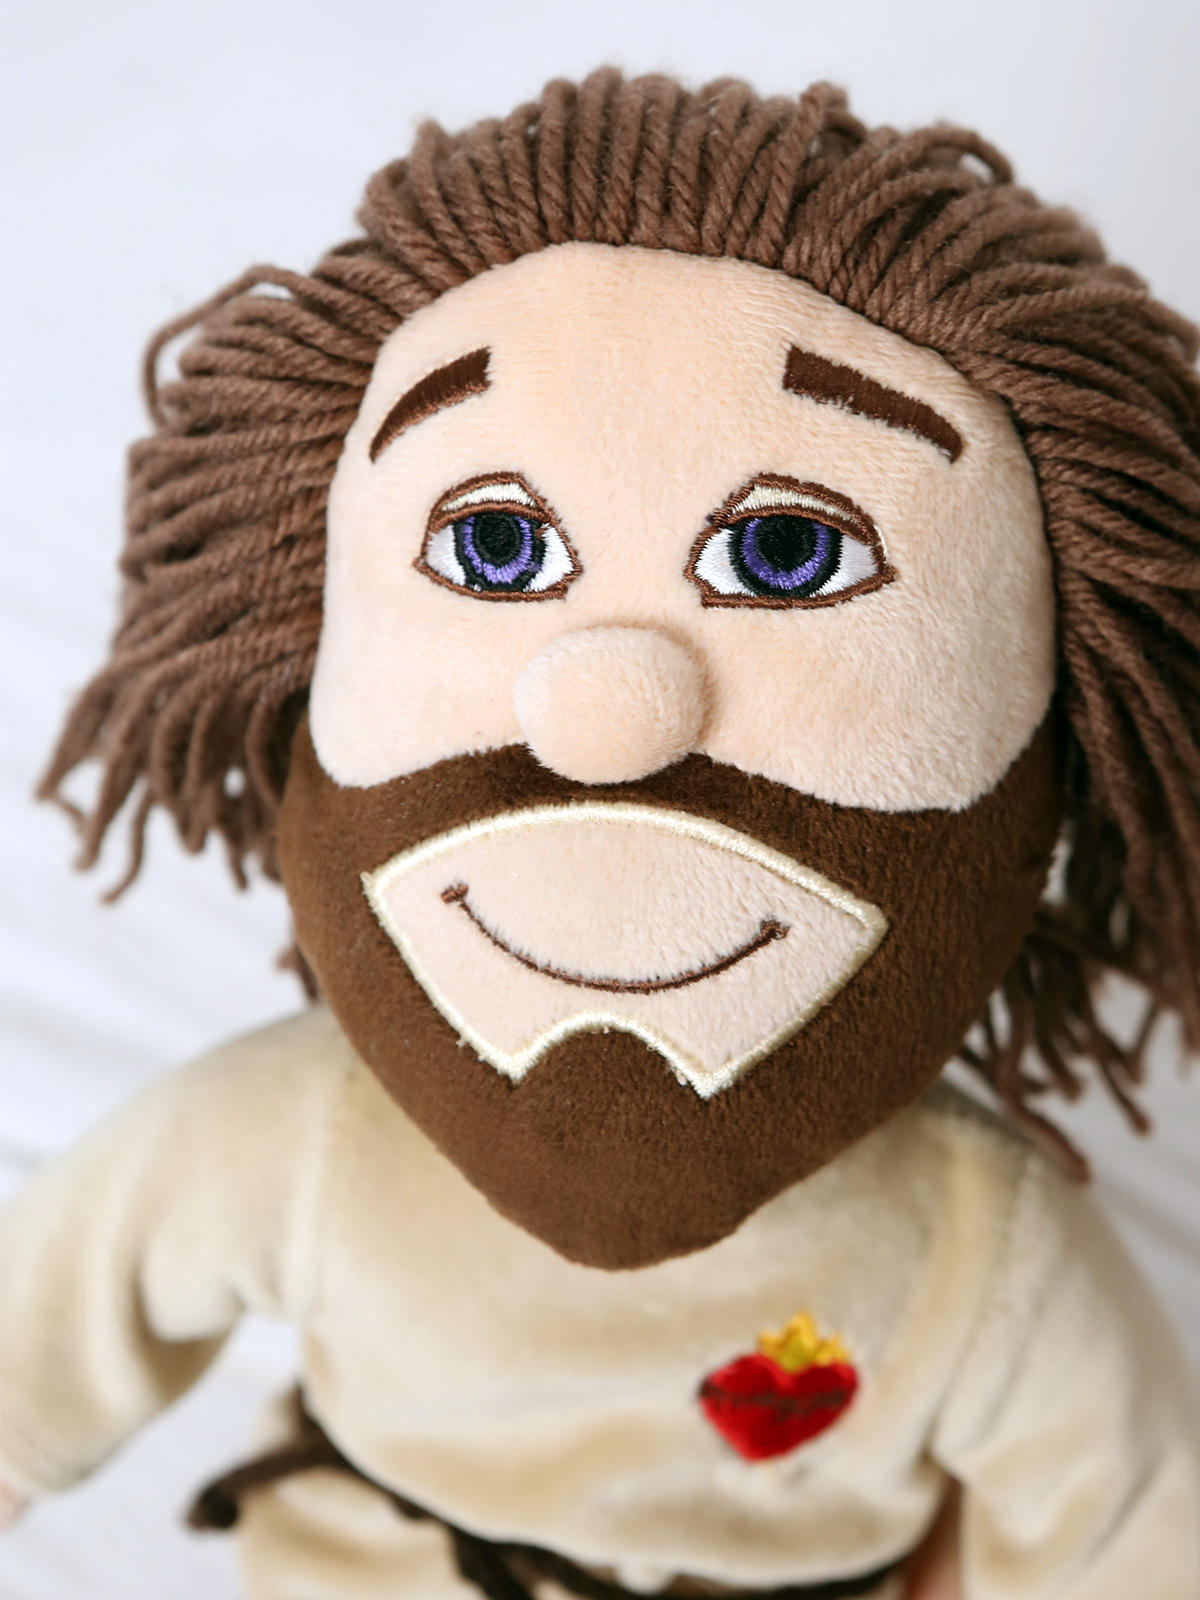 Jesus Cuddly Toy